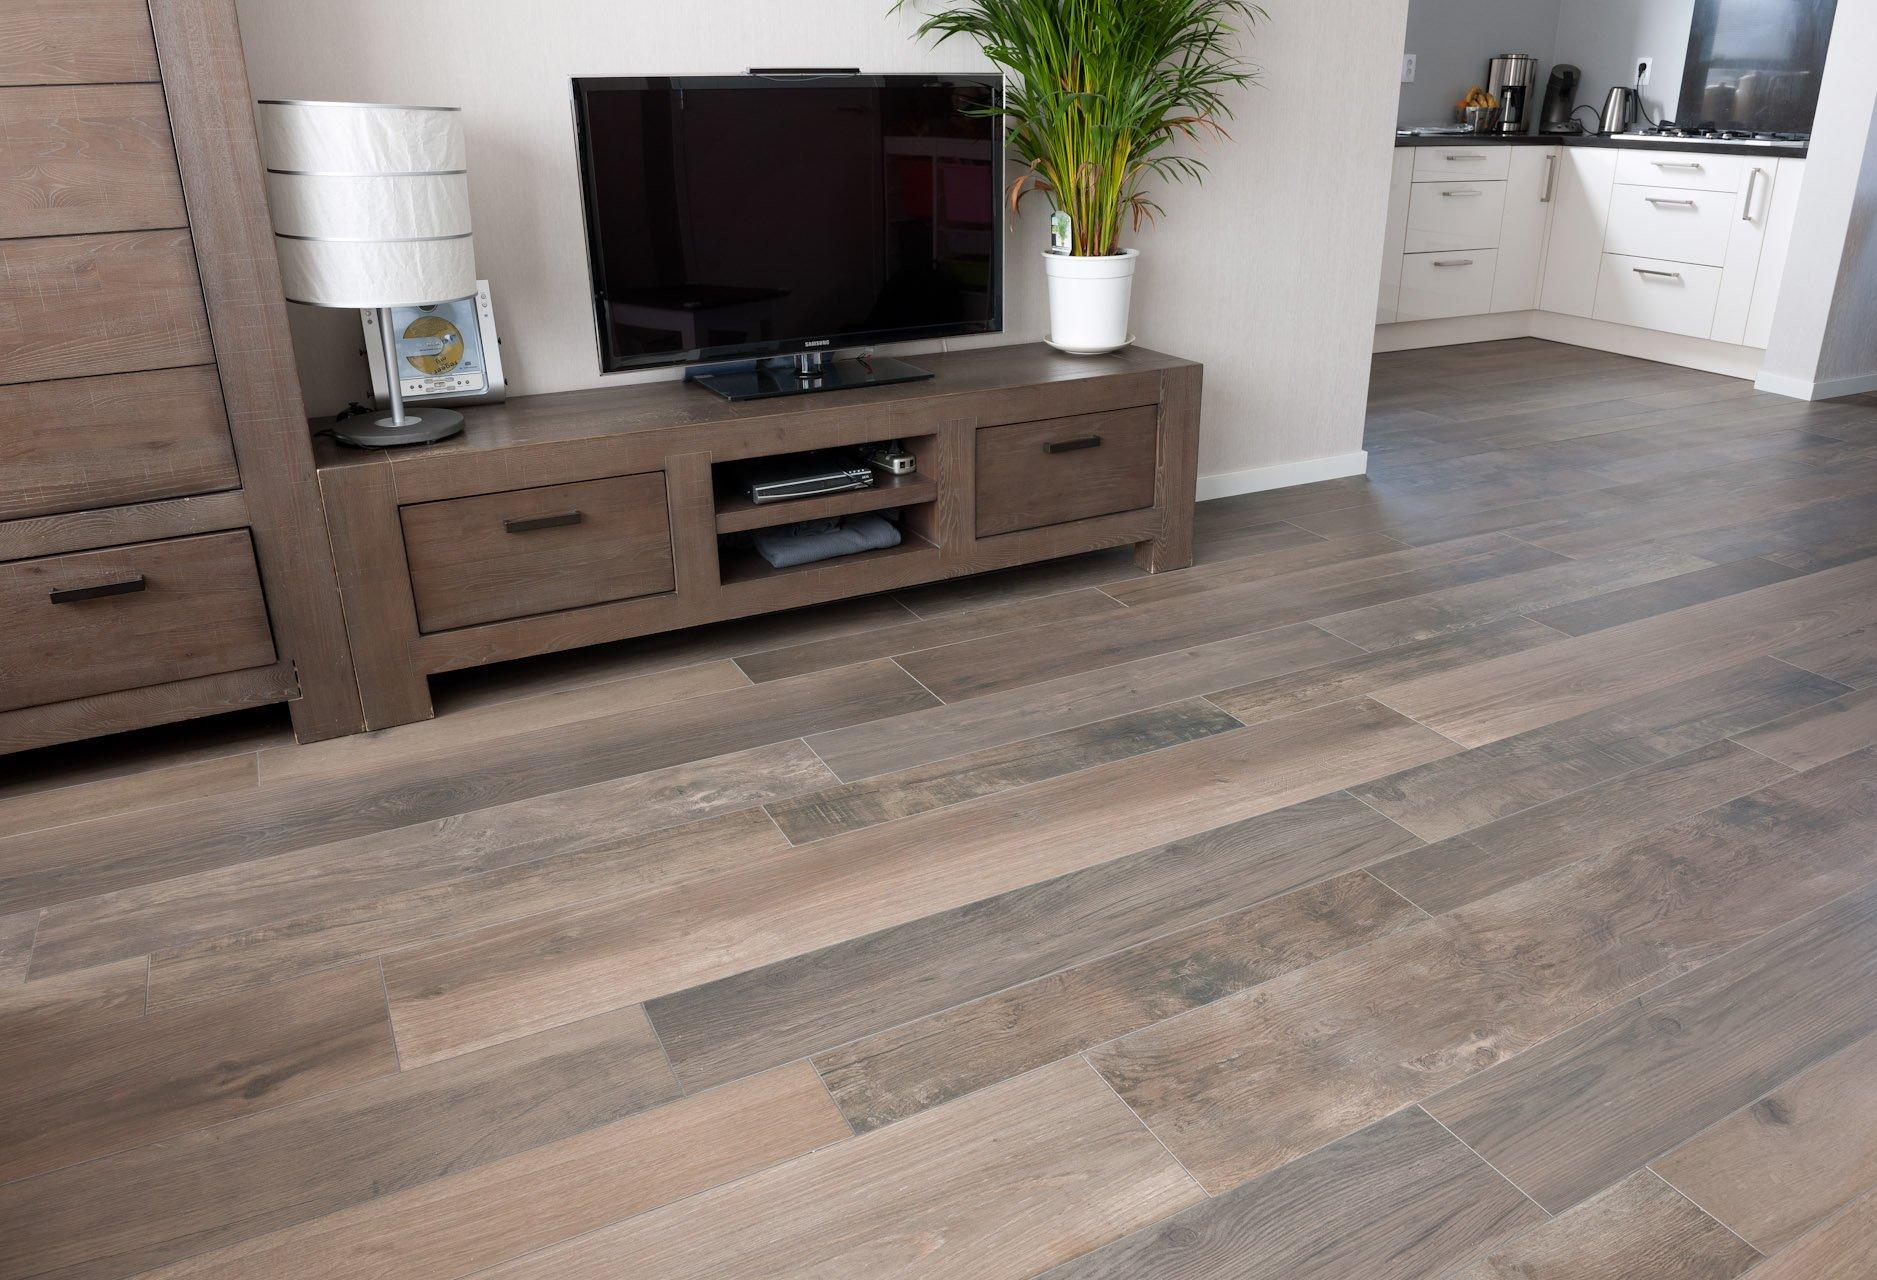 Witte vloeren rust uitstraling en mét korting westwing